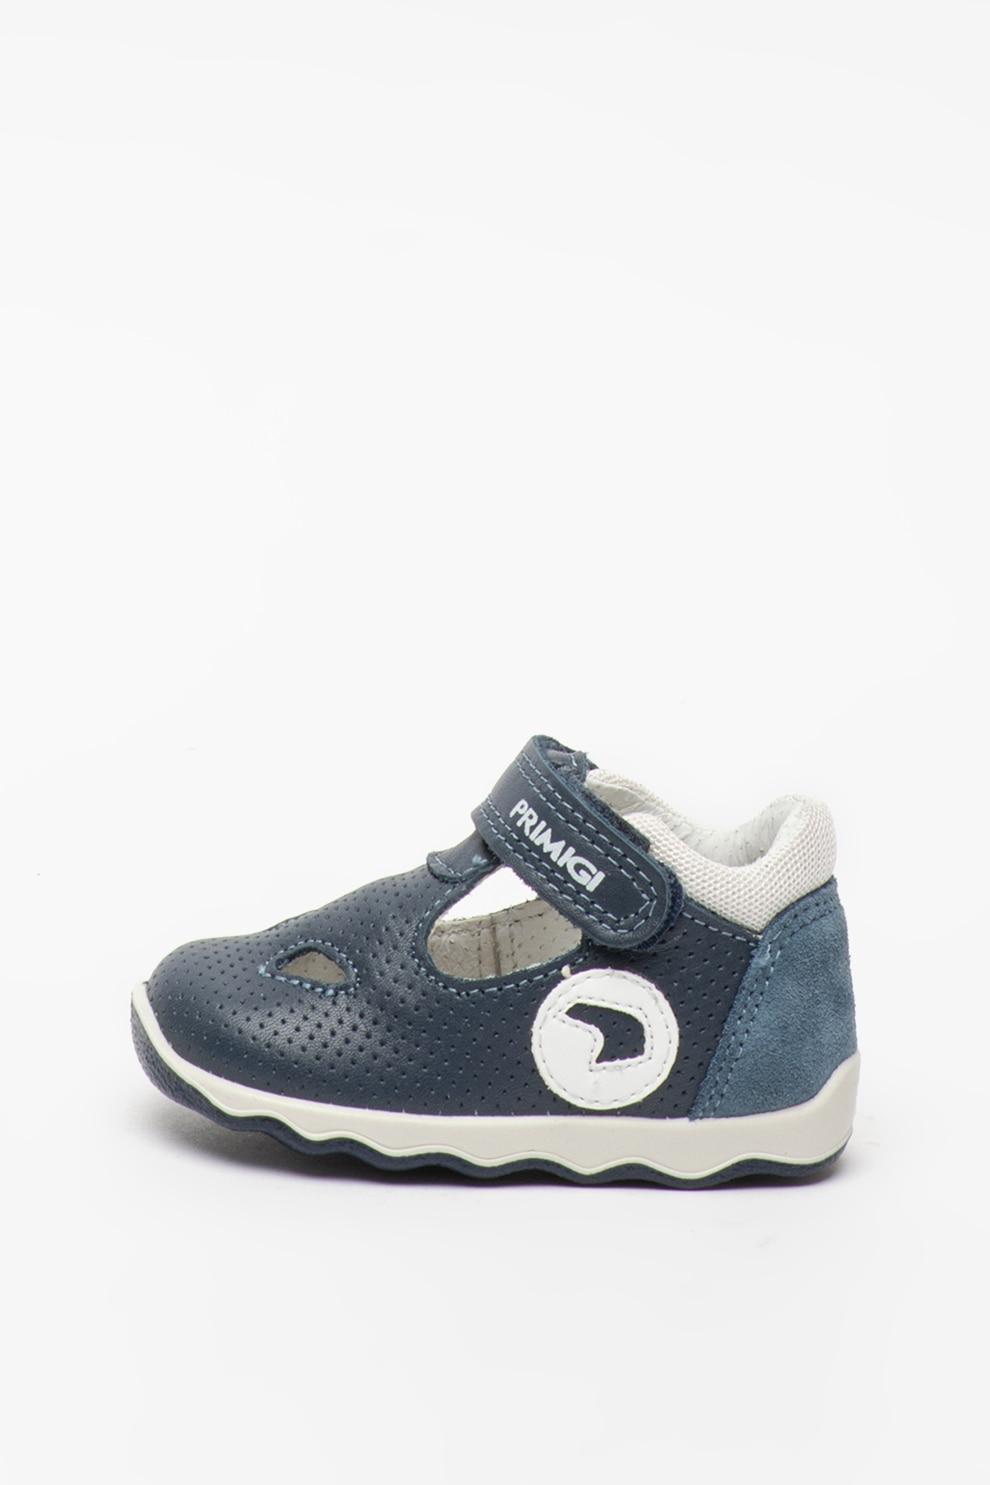 panorama superficial alabanza  Primigi, Pantofi de piele cu velcro si decupaje, Bleumarin, 19 EU - eMAG.ro